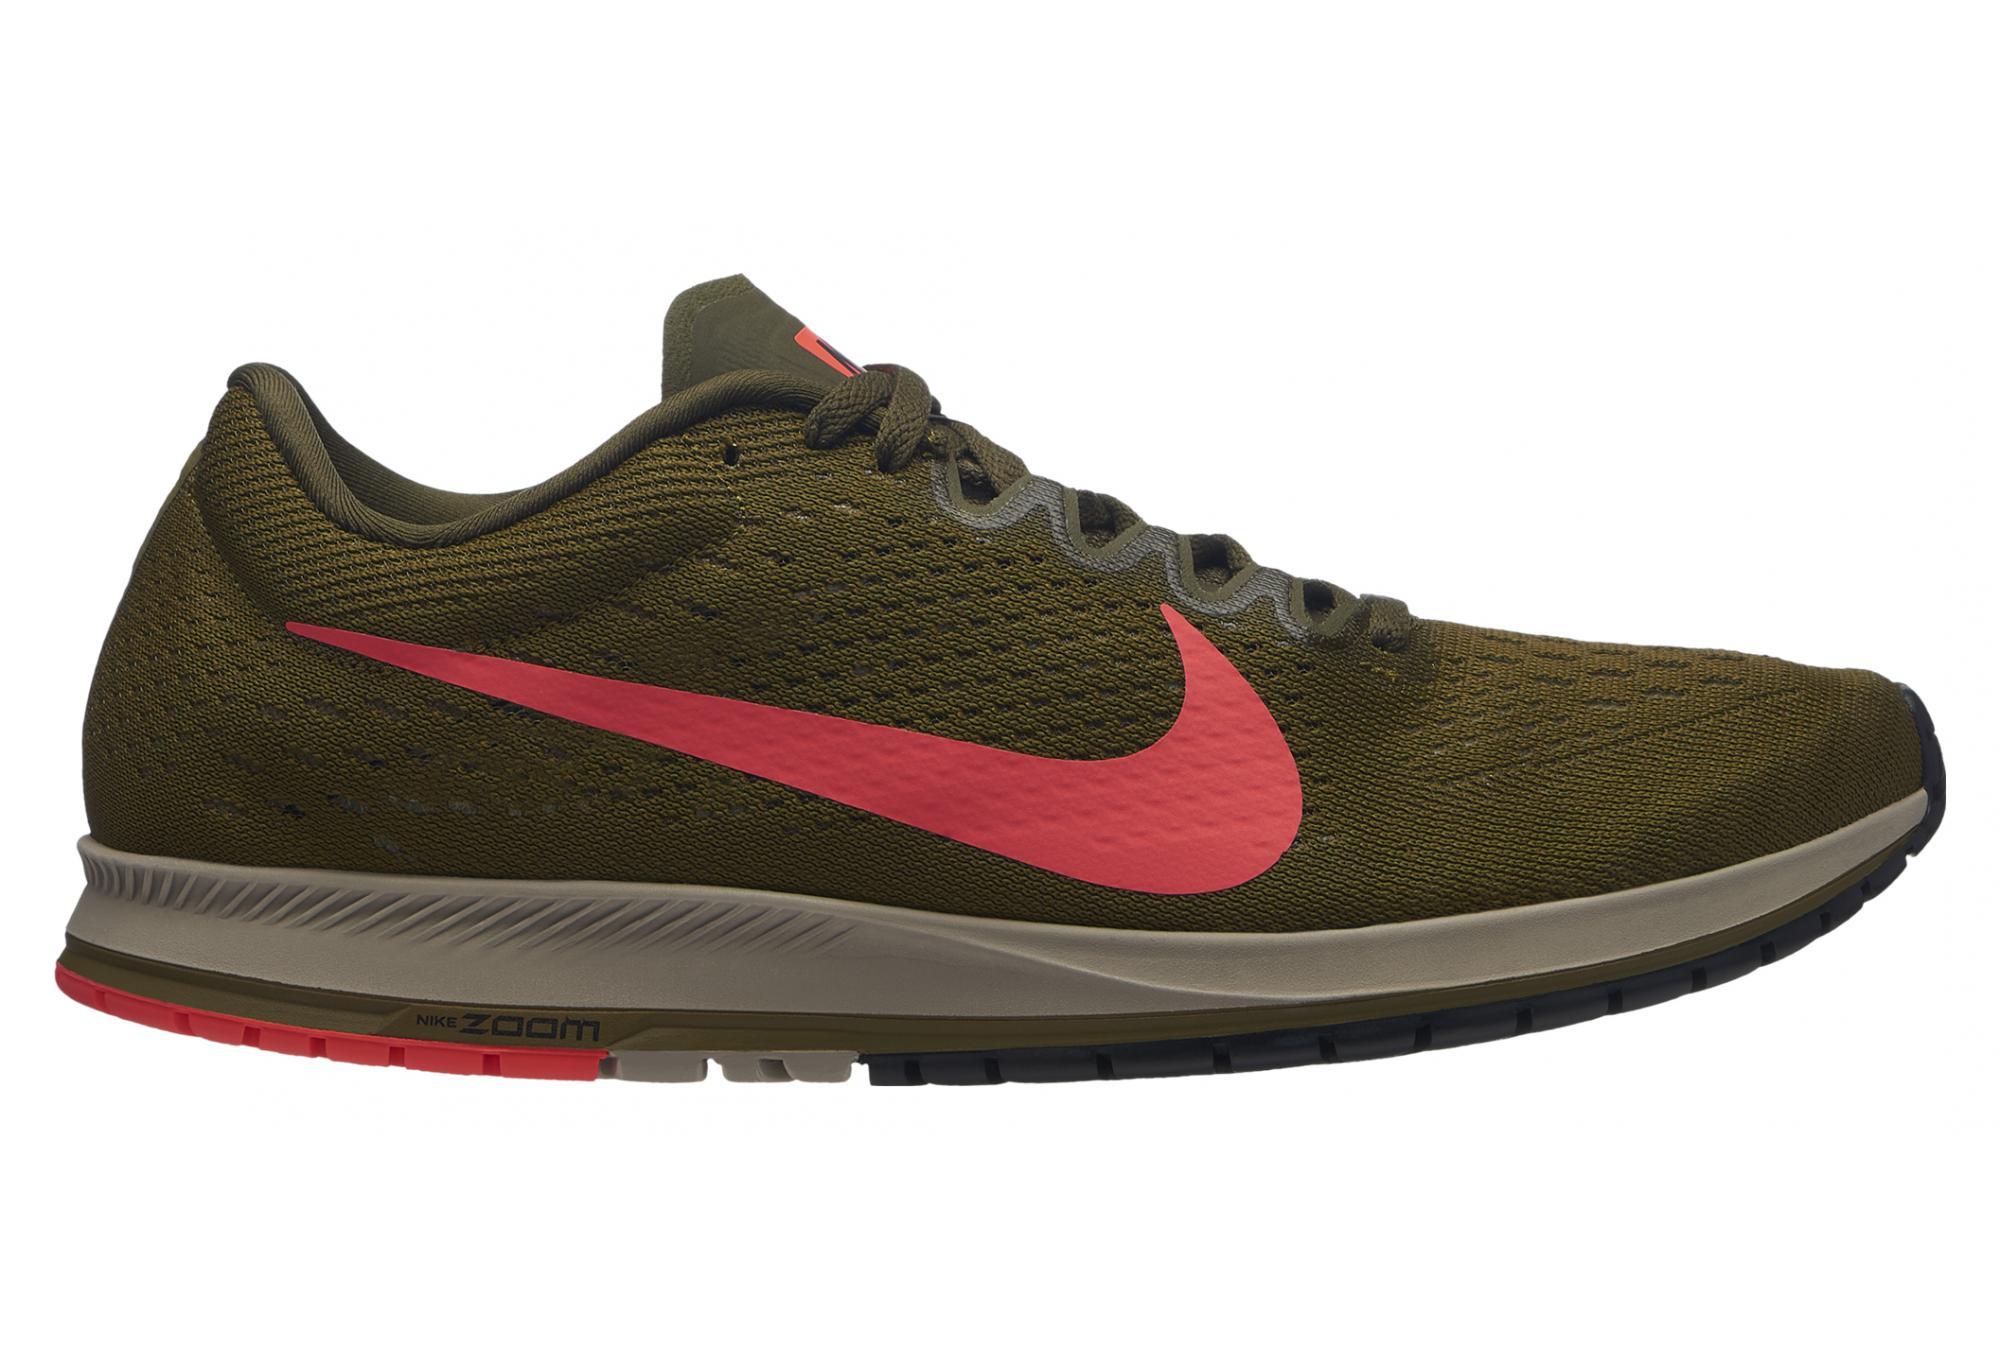 Nike Air Streak 6 scarpe verde Khaki Zoom odvdft2386 Nike